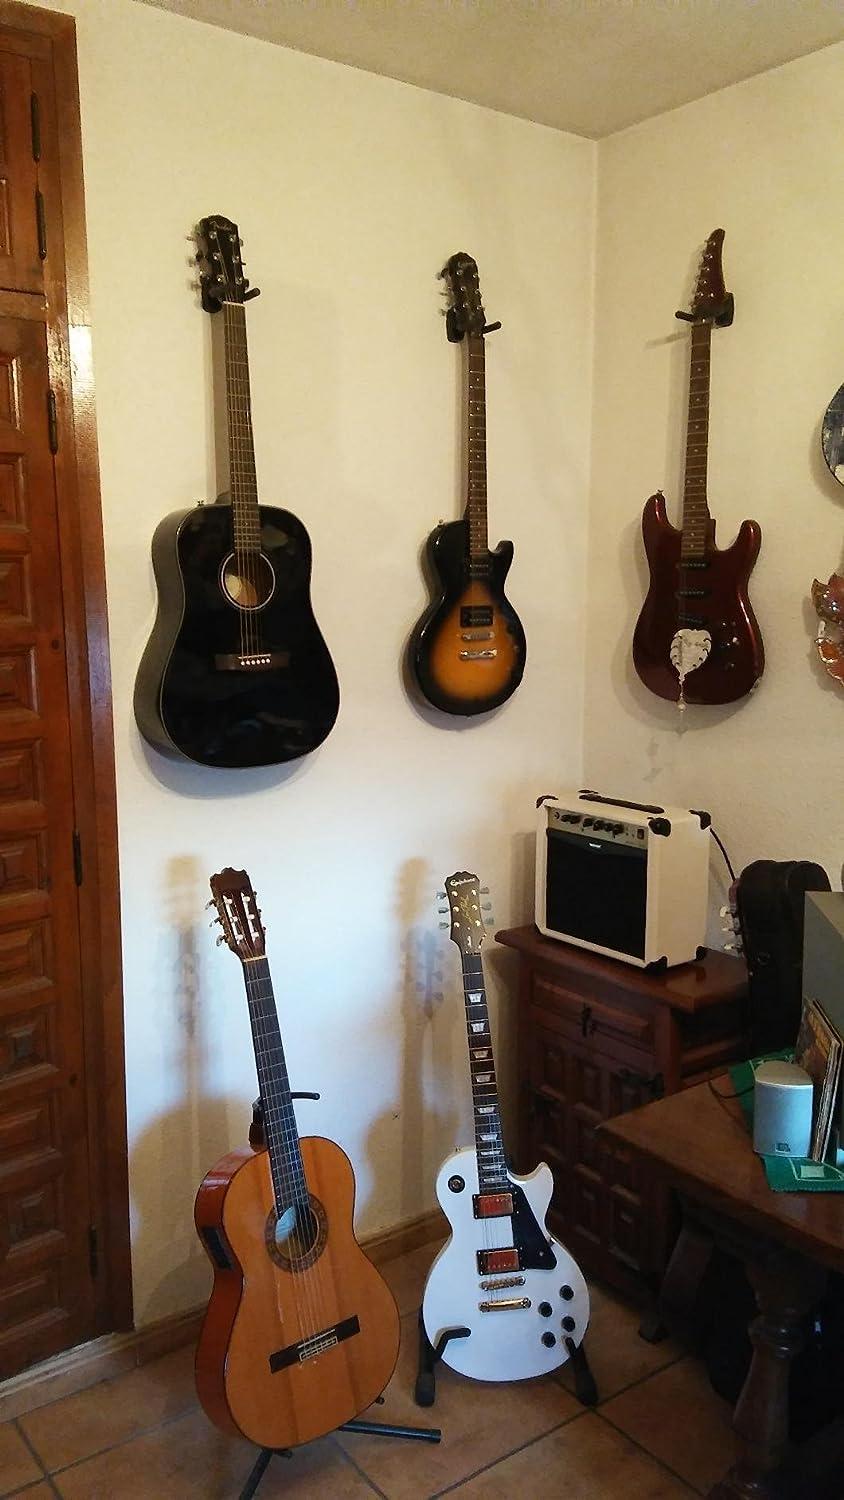 4 perchas para guitarra, soporte de pared, soporte para guitarra acústica, ukelele, bajo, mandolina banjo, soporte de pared, ganchos negros (3+8): ...